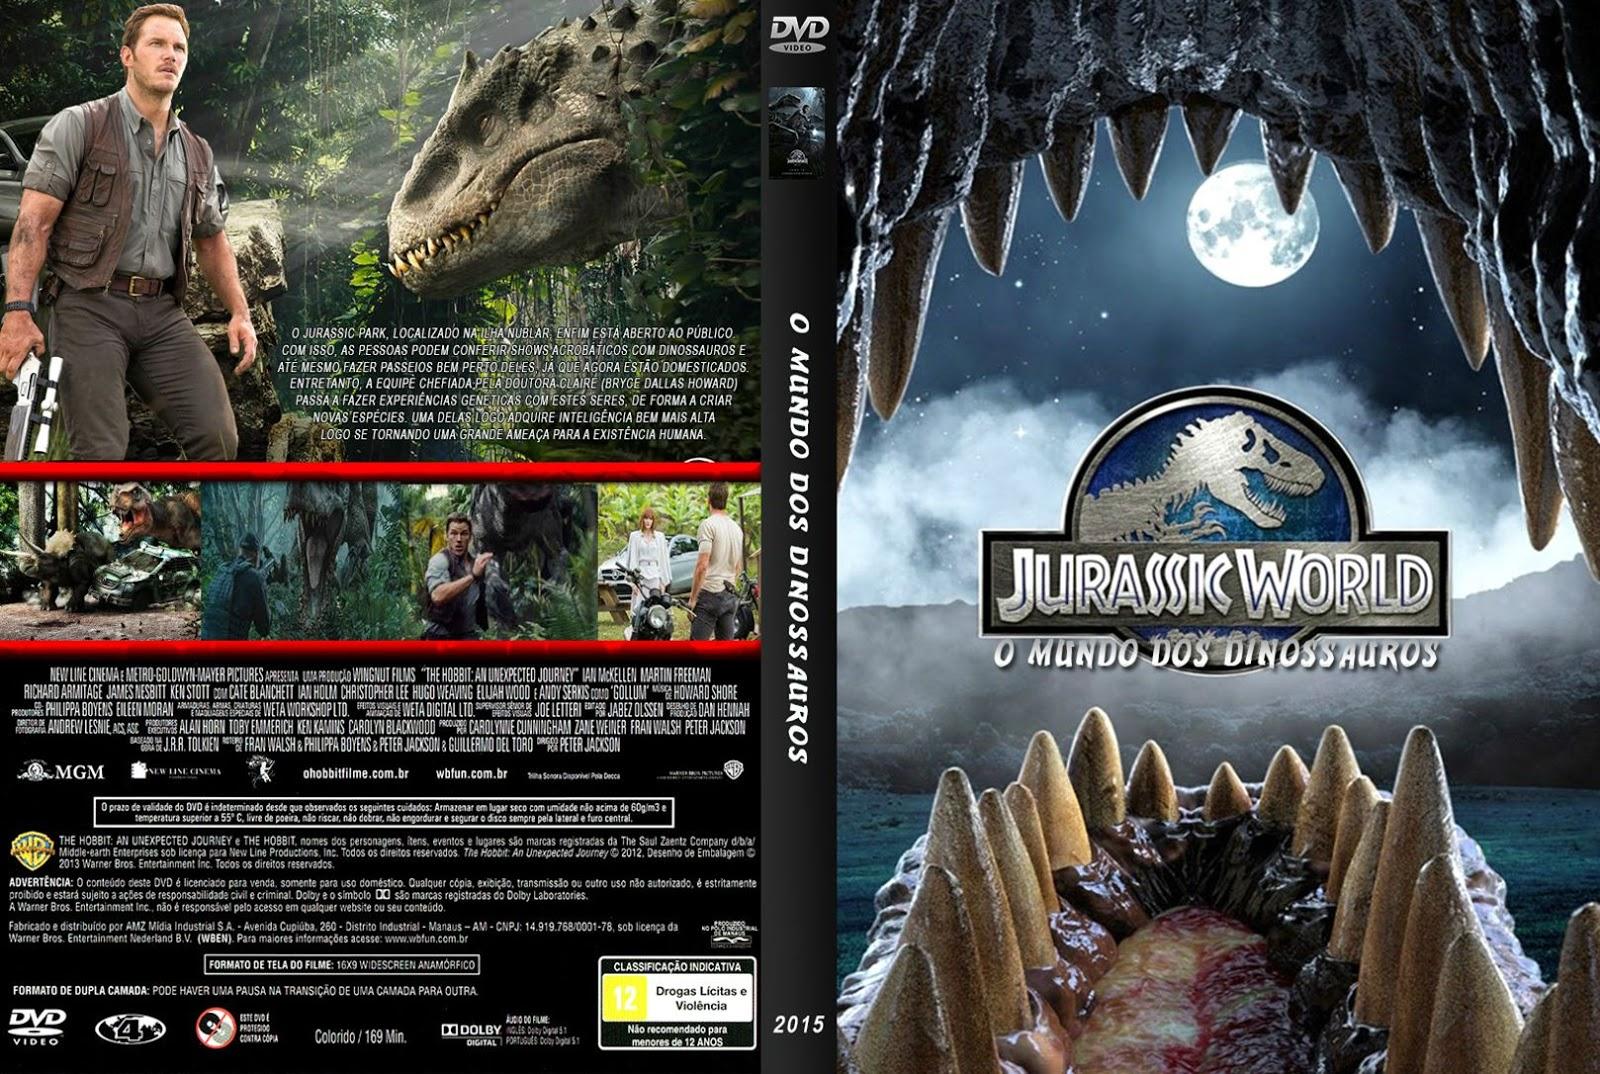 Download Jurassic World O Mundo dos Dinossauros BDRip XviD Dual Áudio Jurassic 2BWorld 2BO 2BMundo 2BDos 2BDinossauros